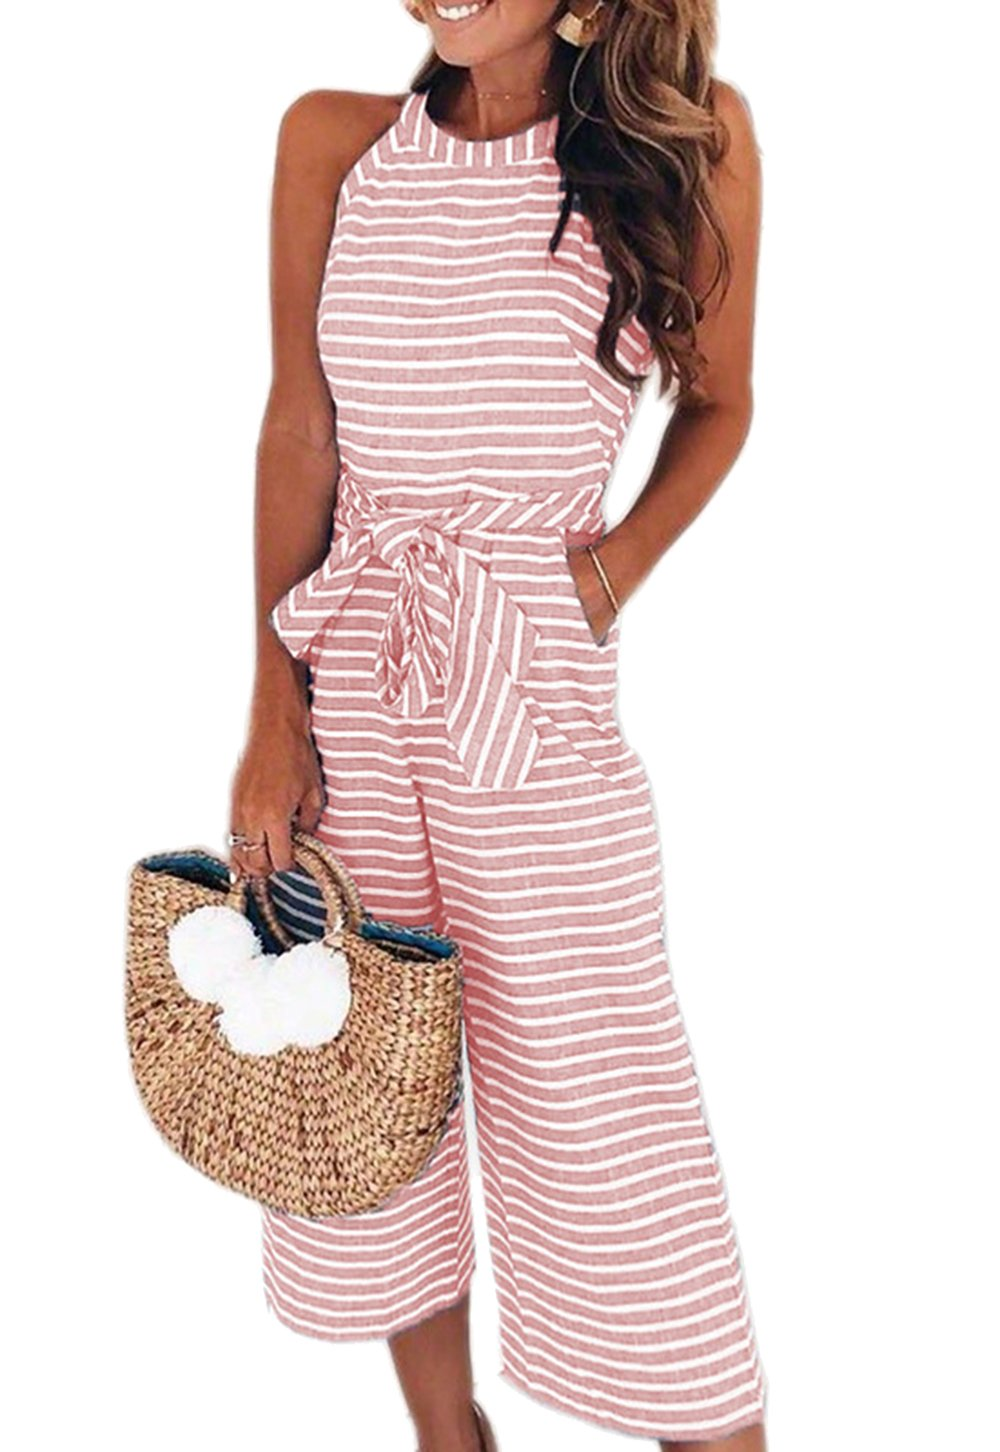 PRETTYGARDEN 2018 Women's Striped Sleeveless Waist Belted Zipper Back Wide Leg Loose Jumpsuit Romper with Pockets (Pink, X-Large)